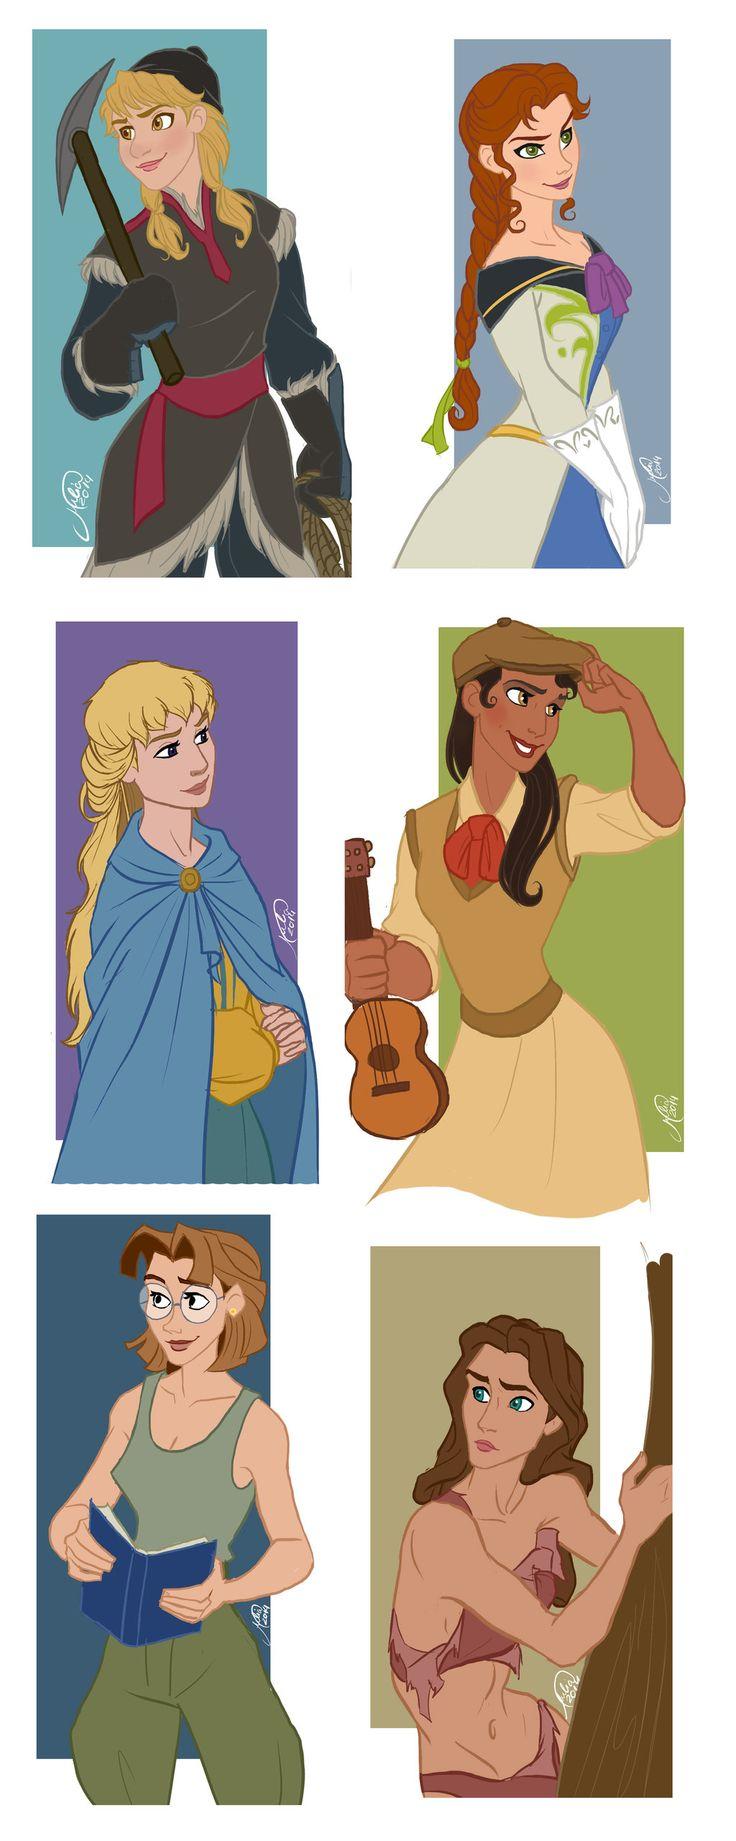 Disney Guys - Genderbend by juliajm15.deviantart.com on @deviantART - Genderbent versions of Kristoff, Hans, Phoebus (I LOVE how she turned out here!), Naveen, Milo Thatch, and Tarzan